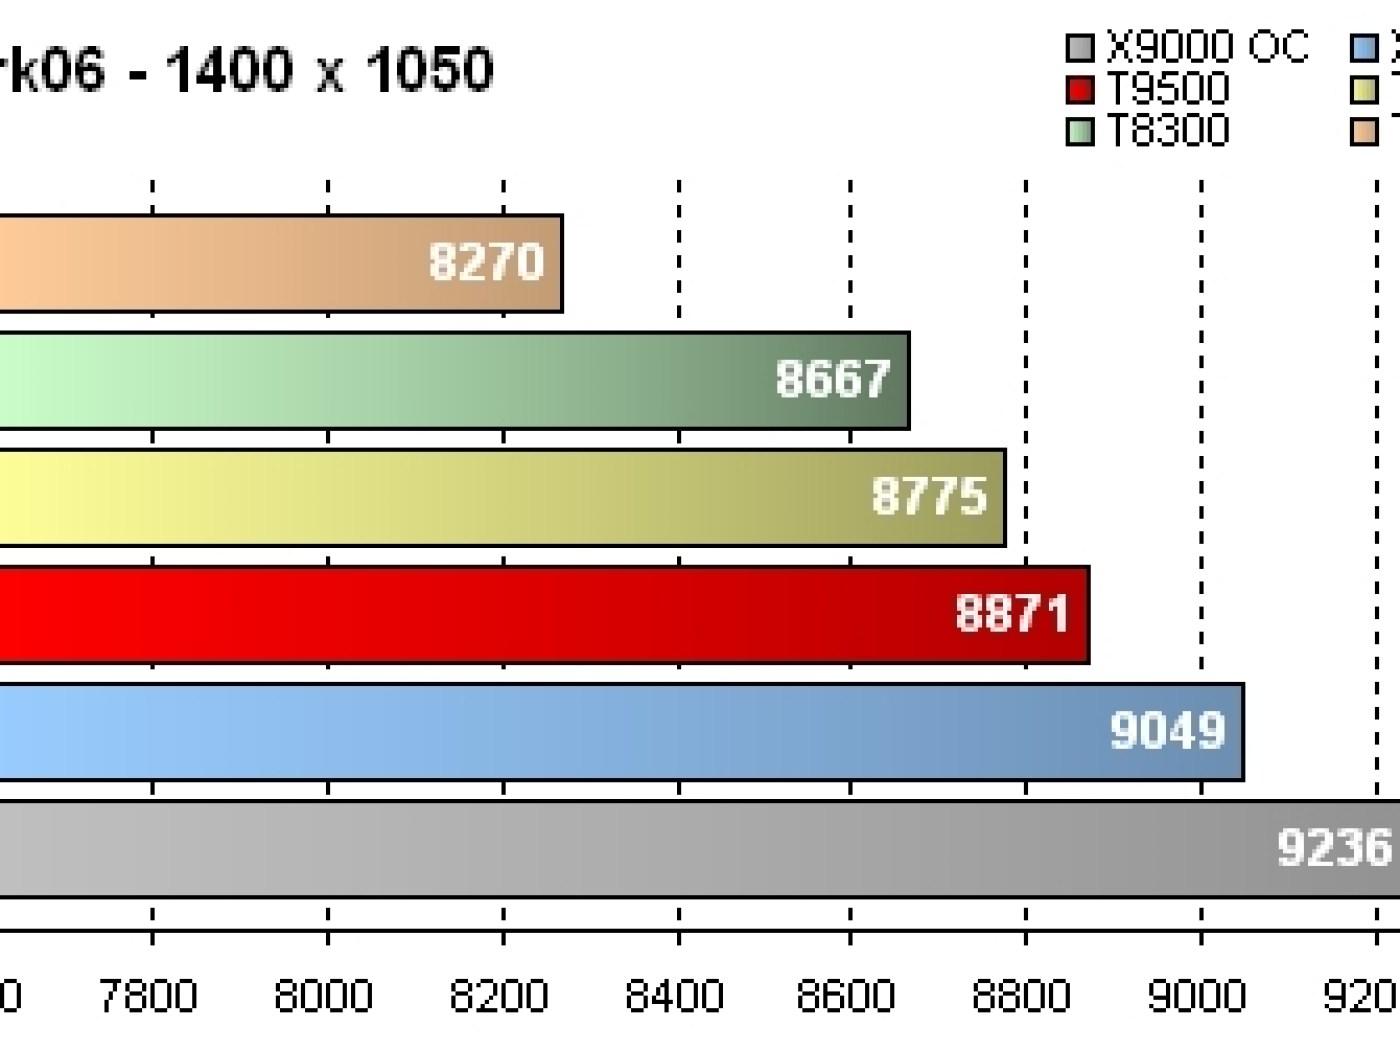 GeForce 8800M GTX - Résultats 3DMark06 Score - 1400 x 1050